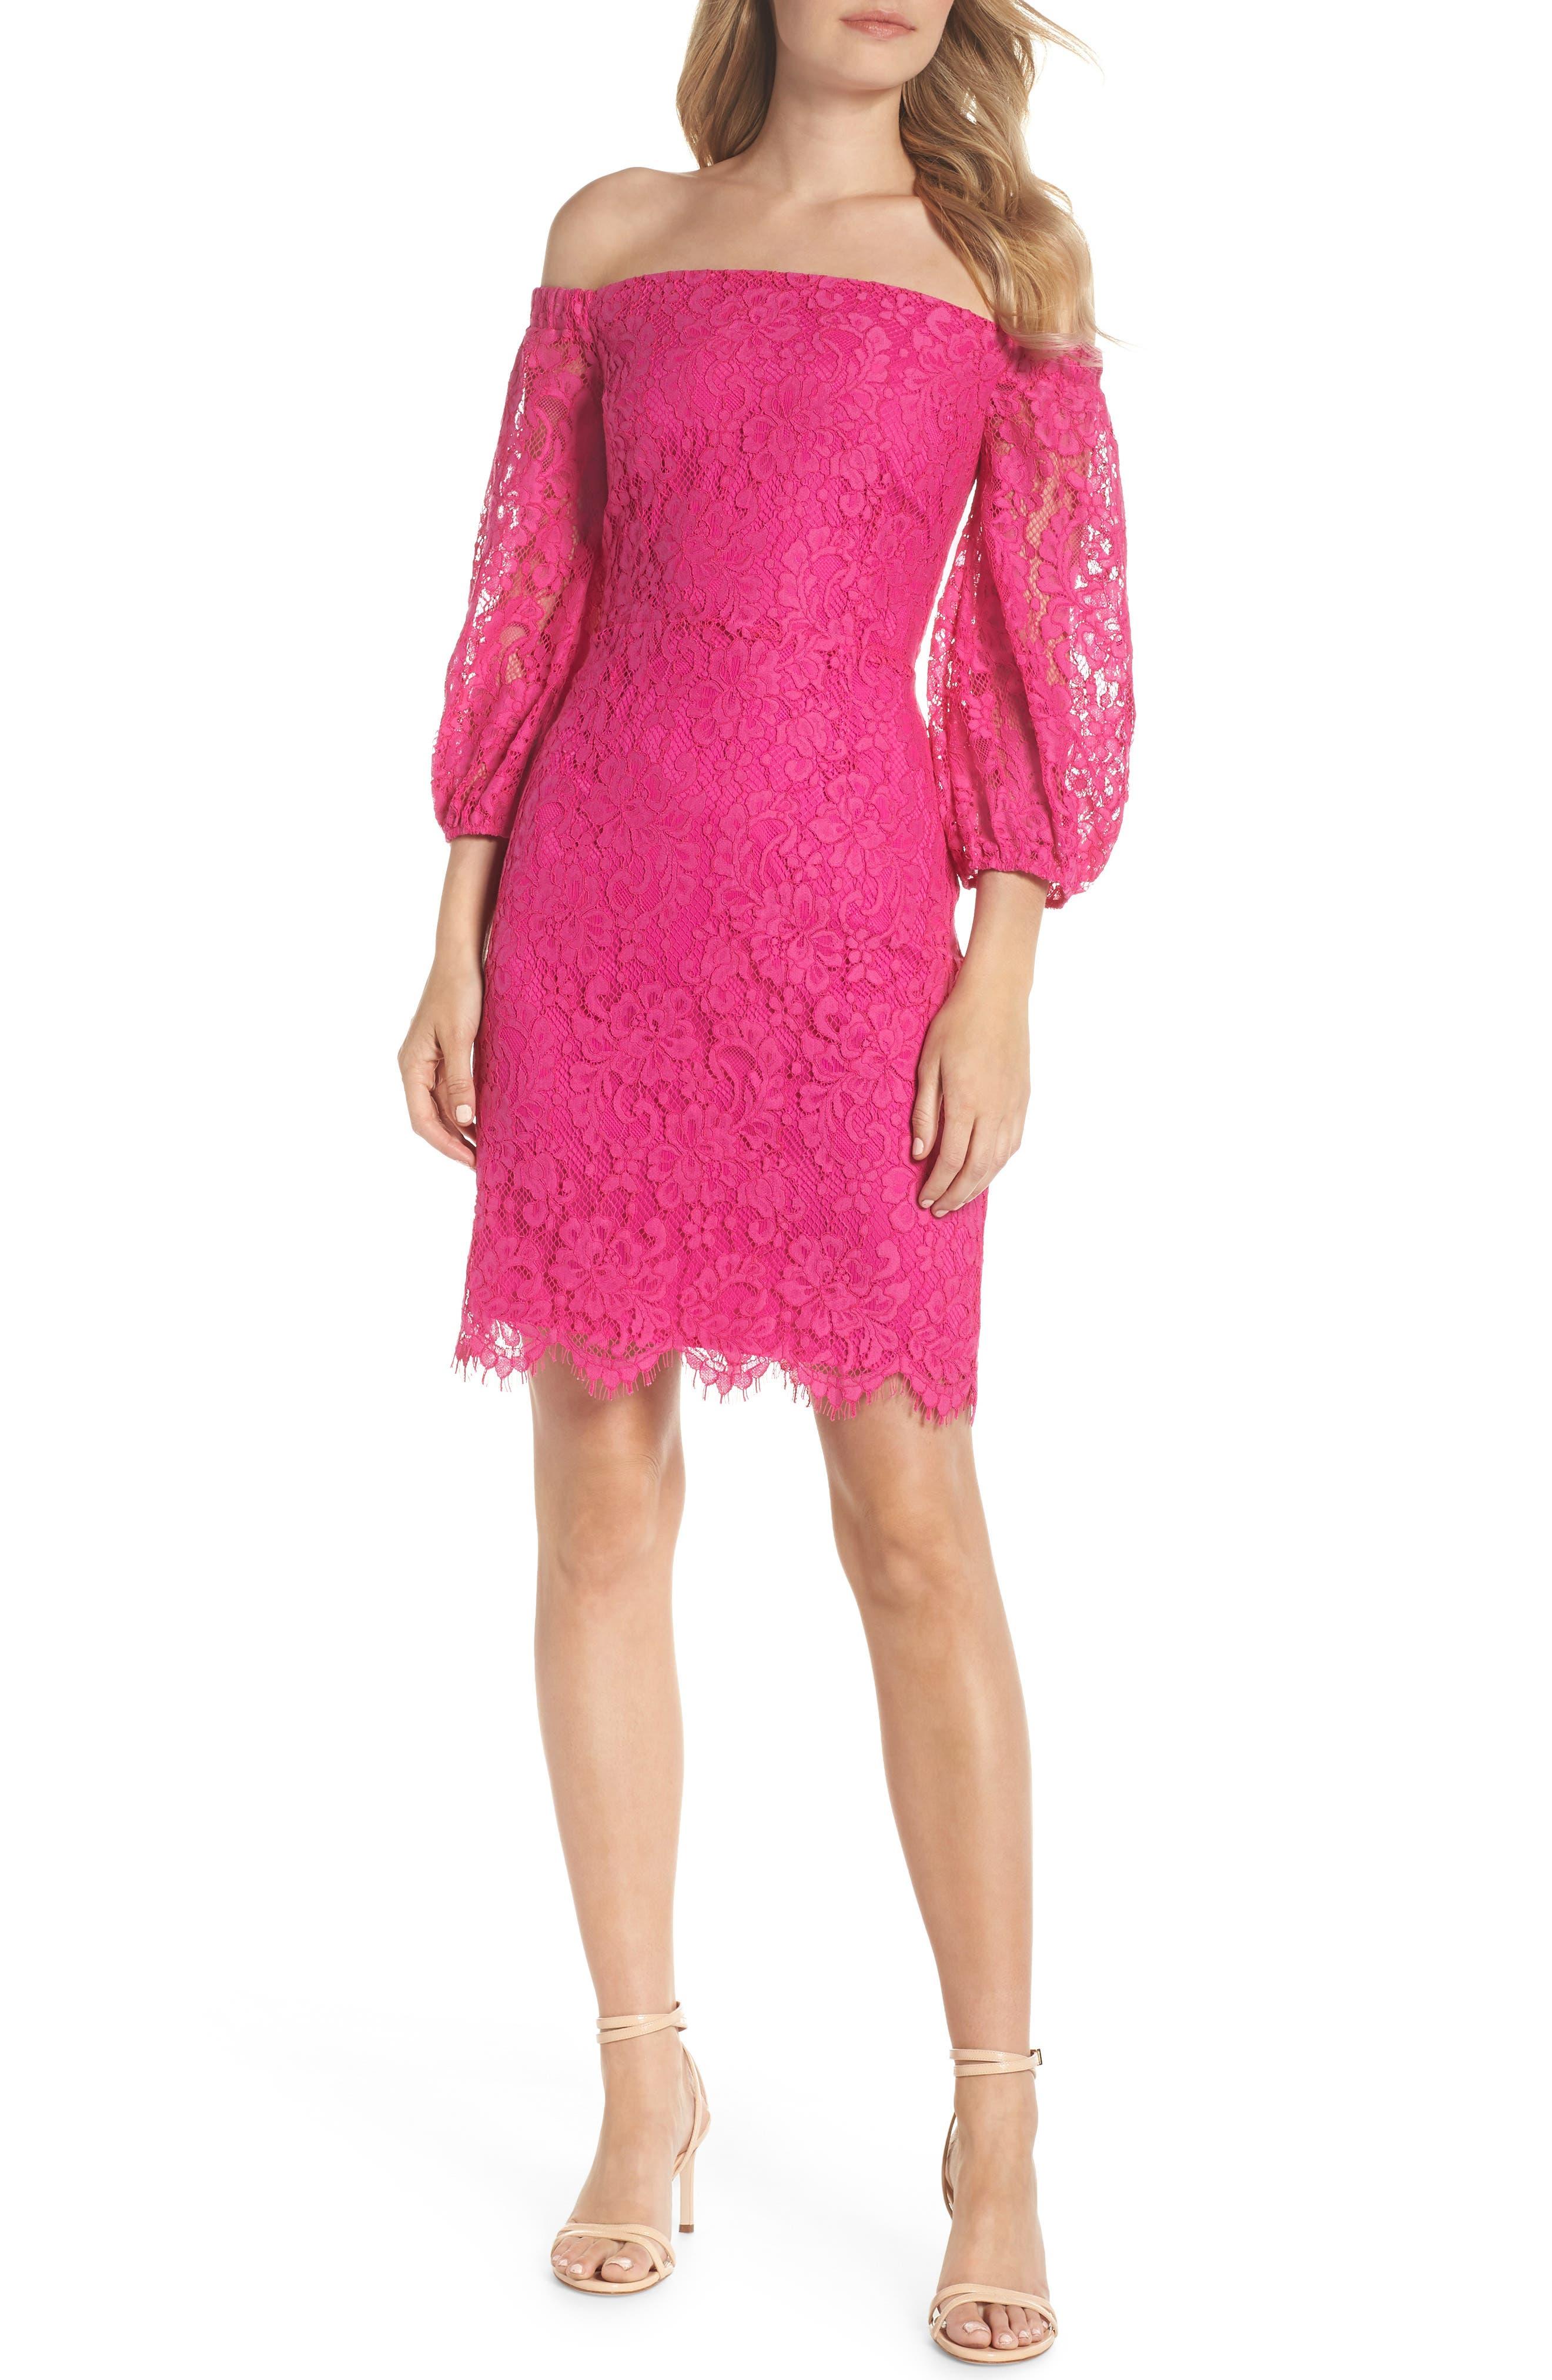 Azul Scallop Hem Off the Shoulder Lace Dress,                         Main,                         color, BRILLIANT FUCHSIA